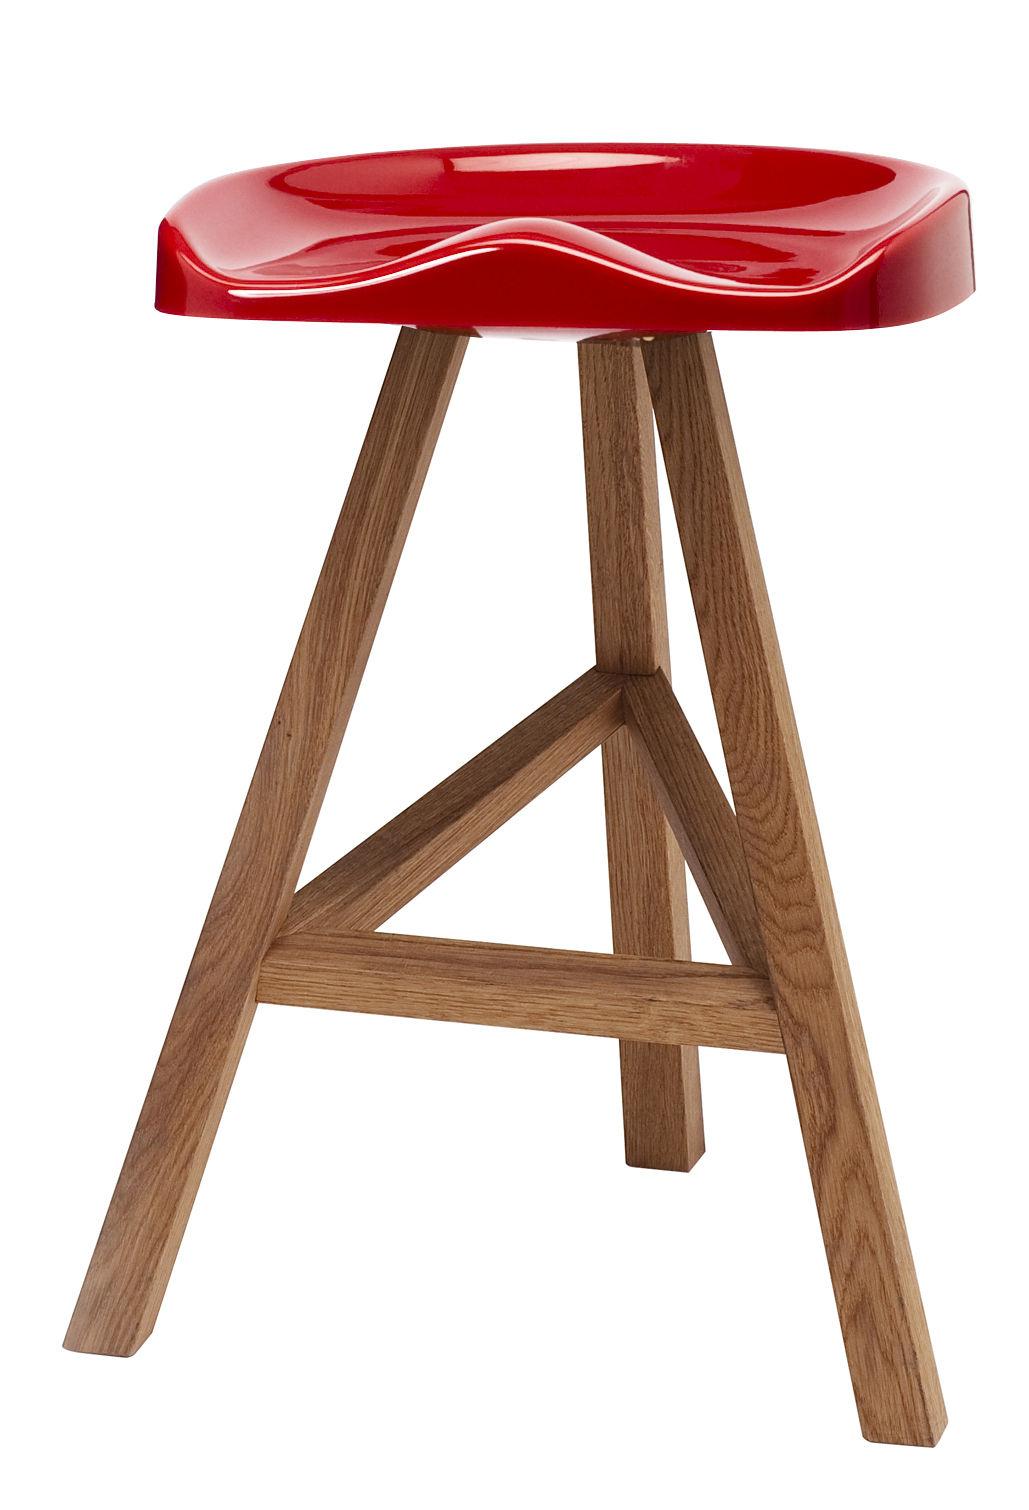 Furniture - Bar Stools - Heidi Bar stool - H 65 cm by Established & Sons - Red - Oiled oak, Polyurethane